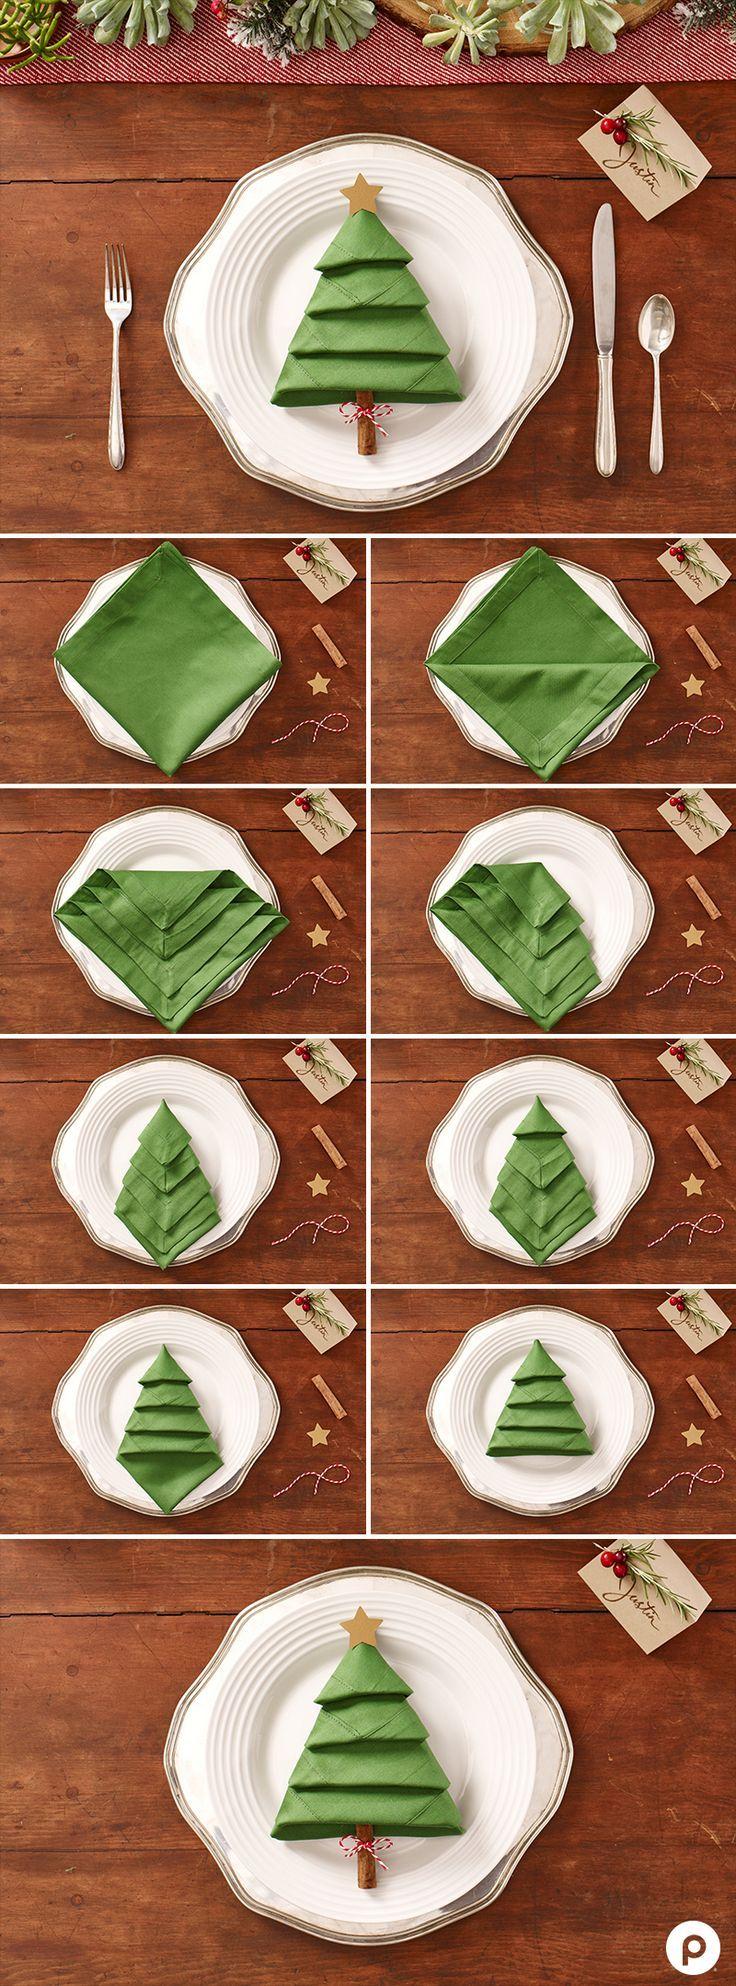 Christmas Tree Napkins: Turn a green napkin into a lovely ...